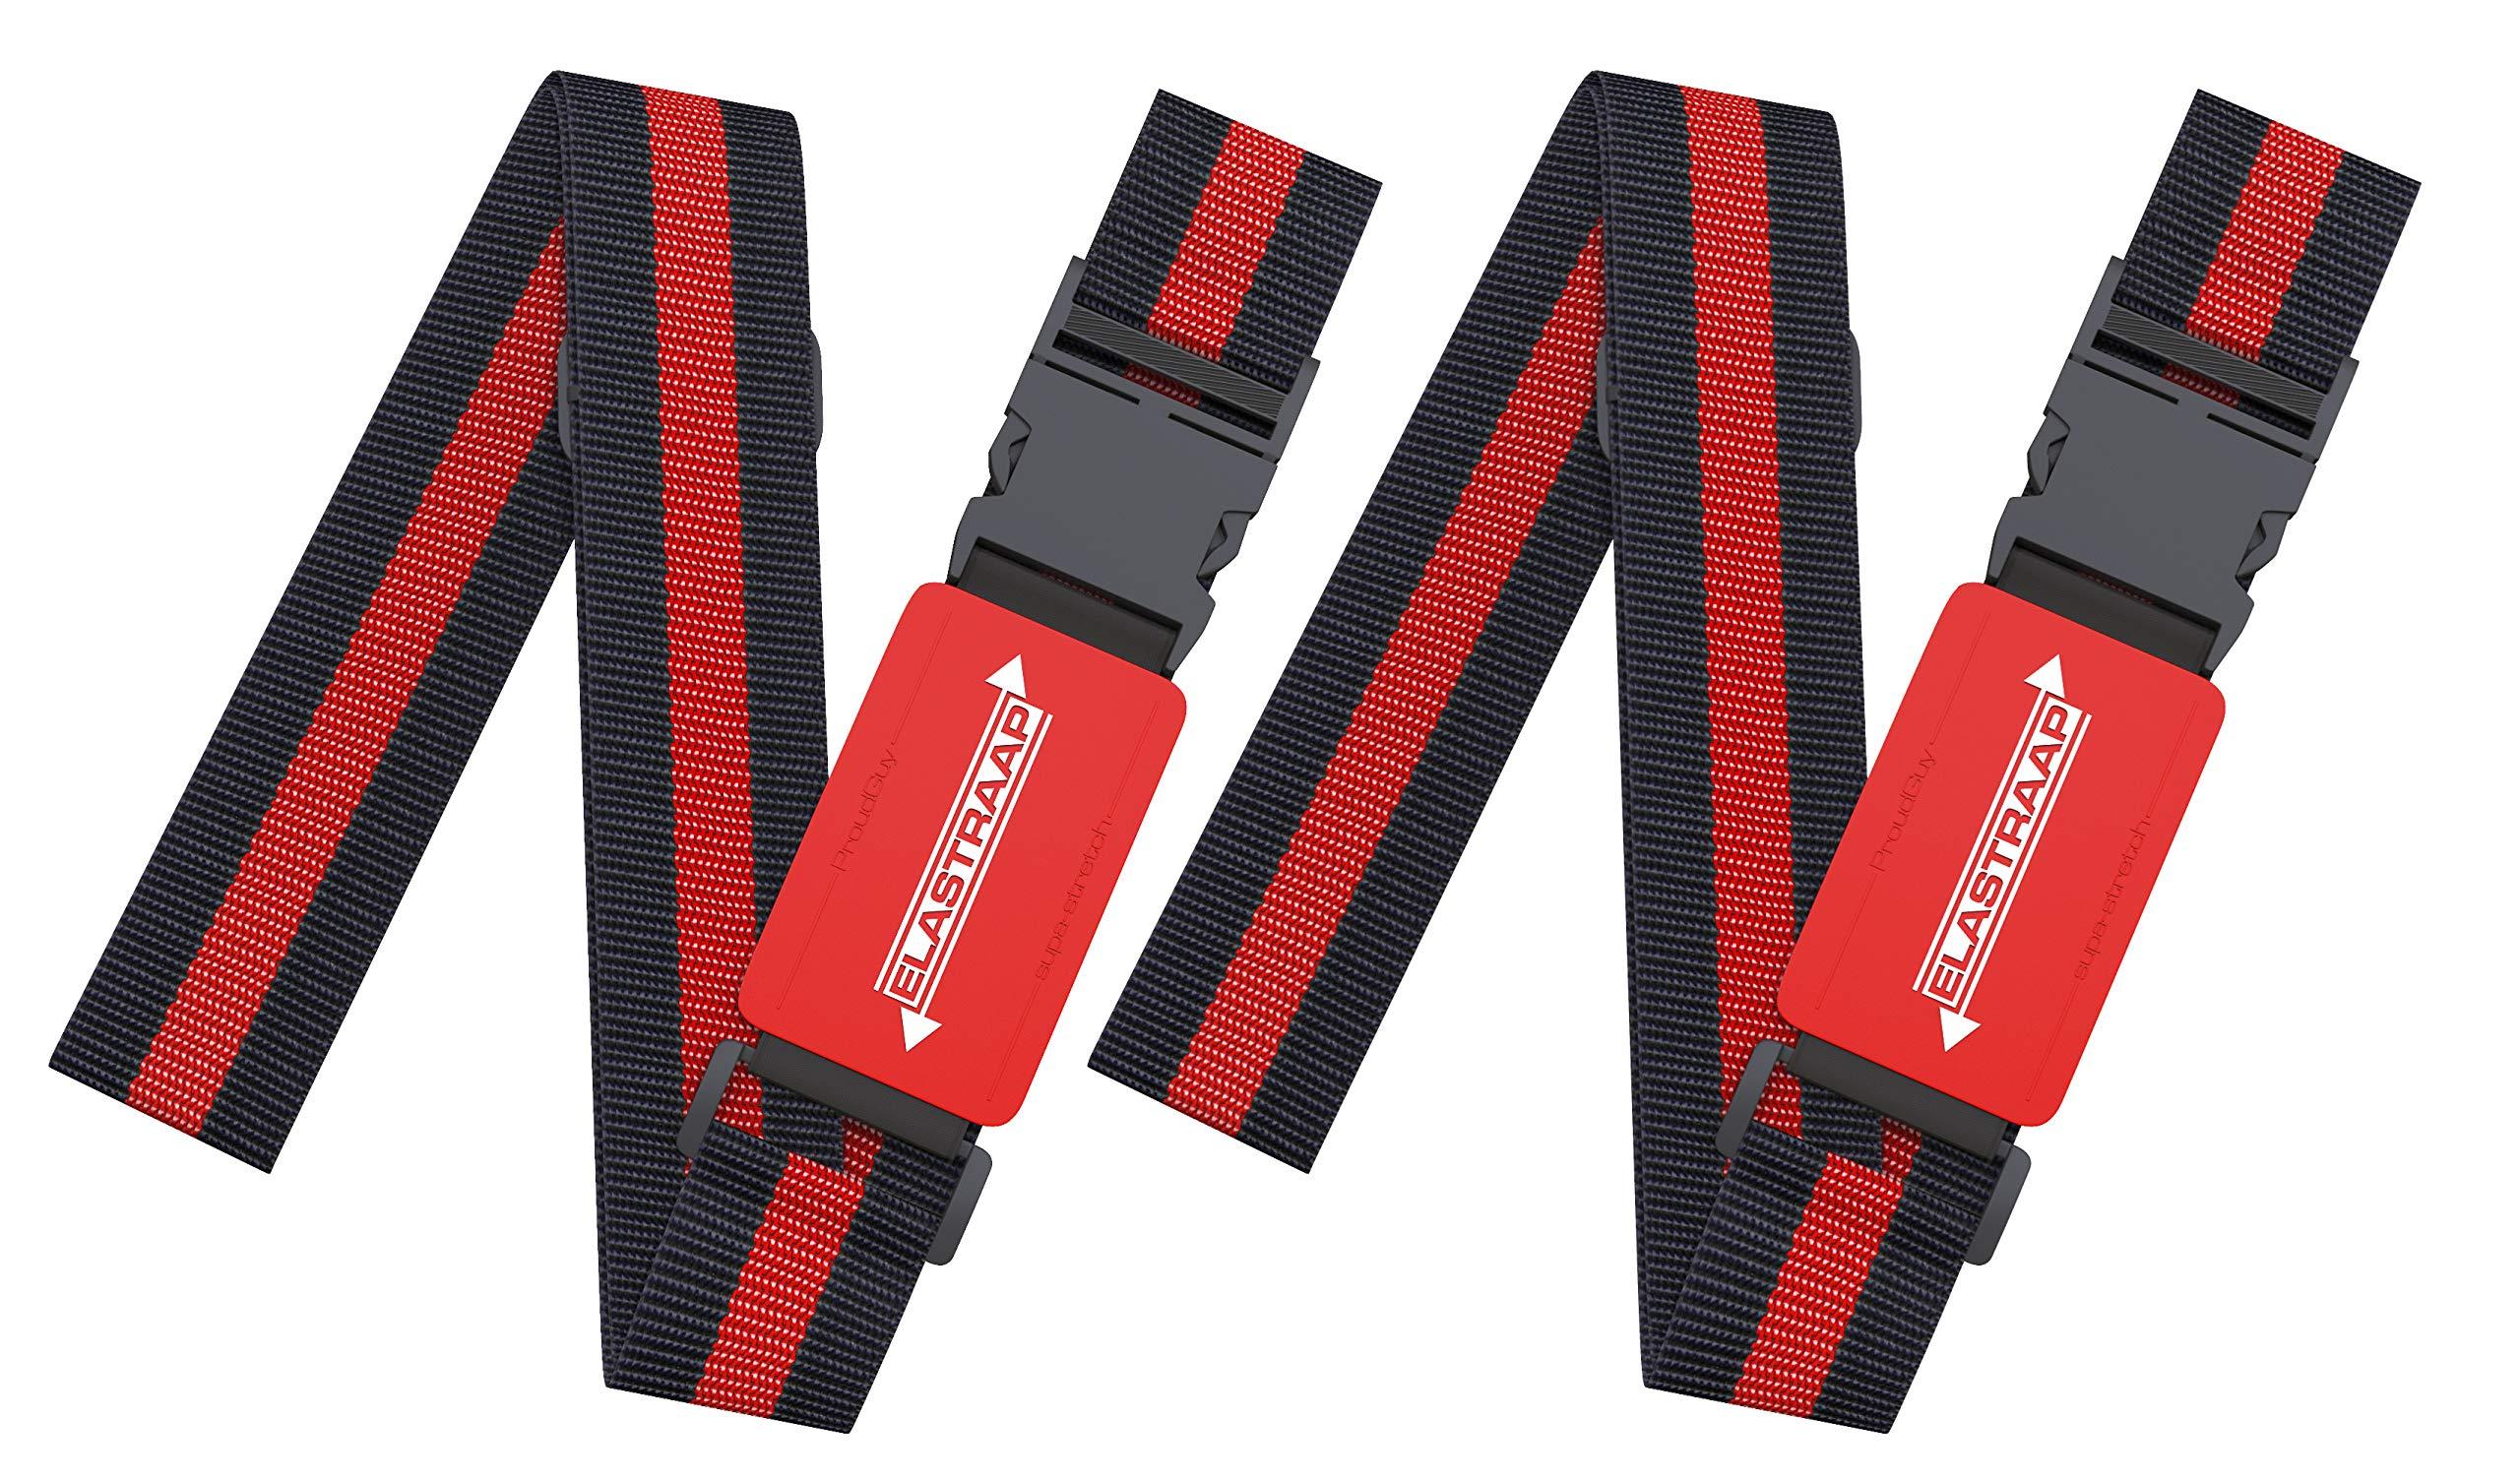 Luggage Straps, Adjustable Non-Slip Baggage Belts- Suitcase Bands For Travel Bag (2 Straps, Red Stripe 2pk)